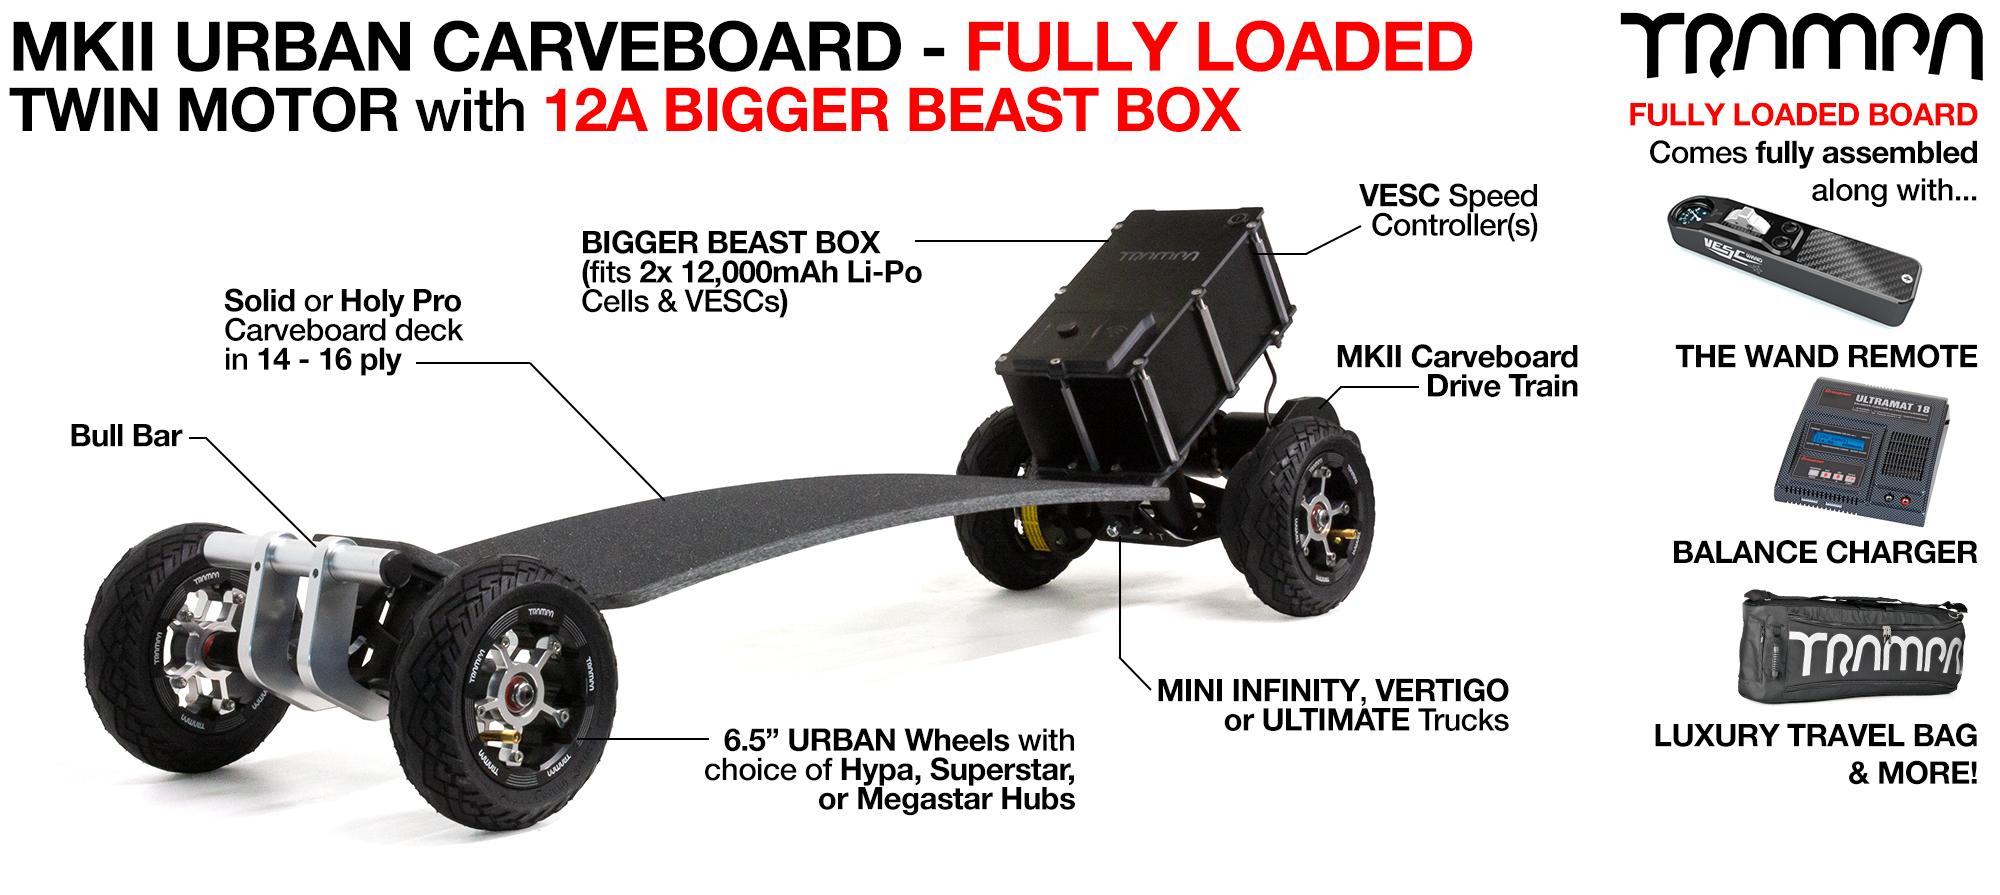 MkII TWIN 160Kv Motor TRAMPA Electric URBAN Carveboard with 16A BEAST Box, VESC HD-60T - Custom Build